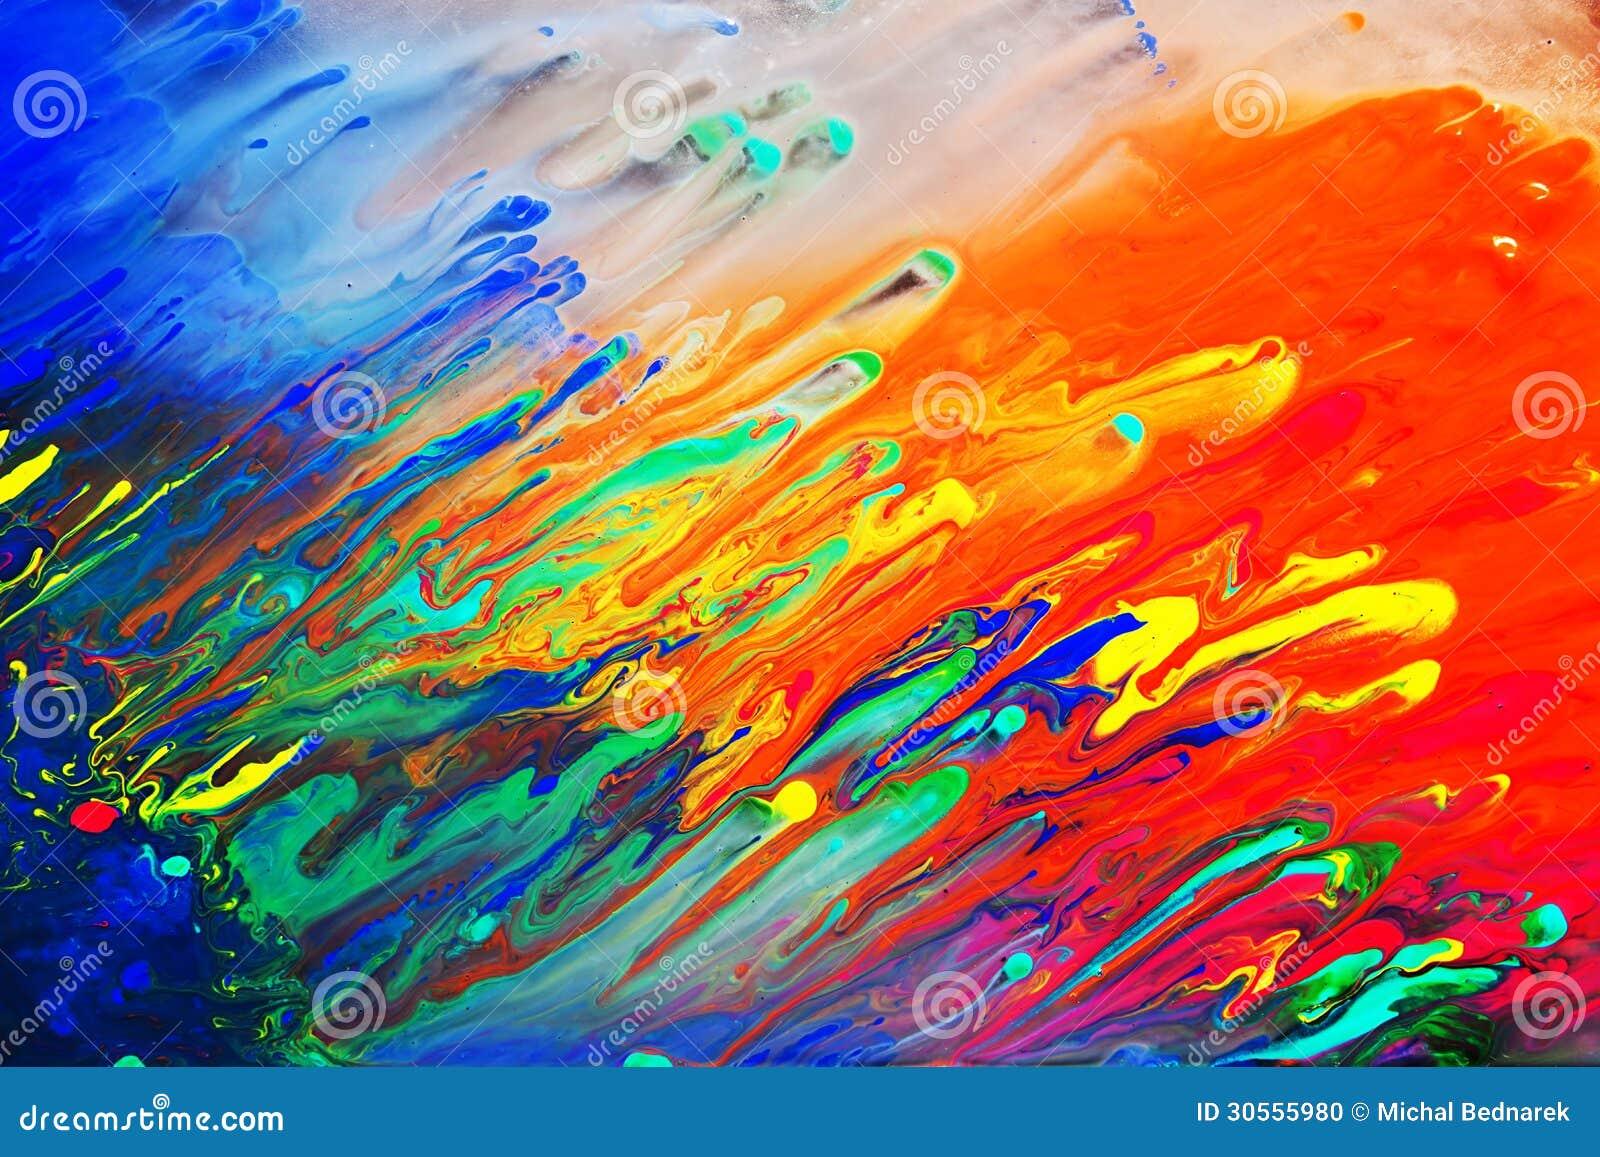 Цветастая абстрактная акриловая картина